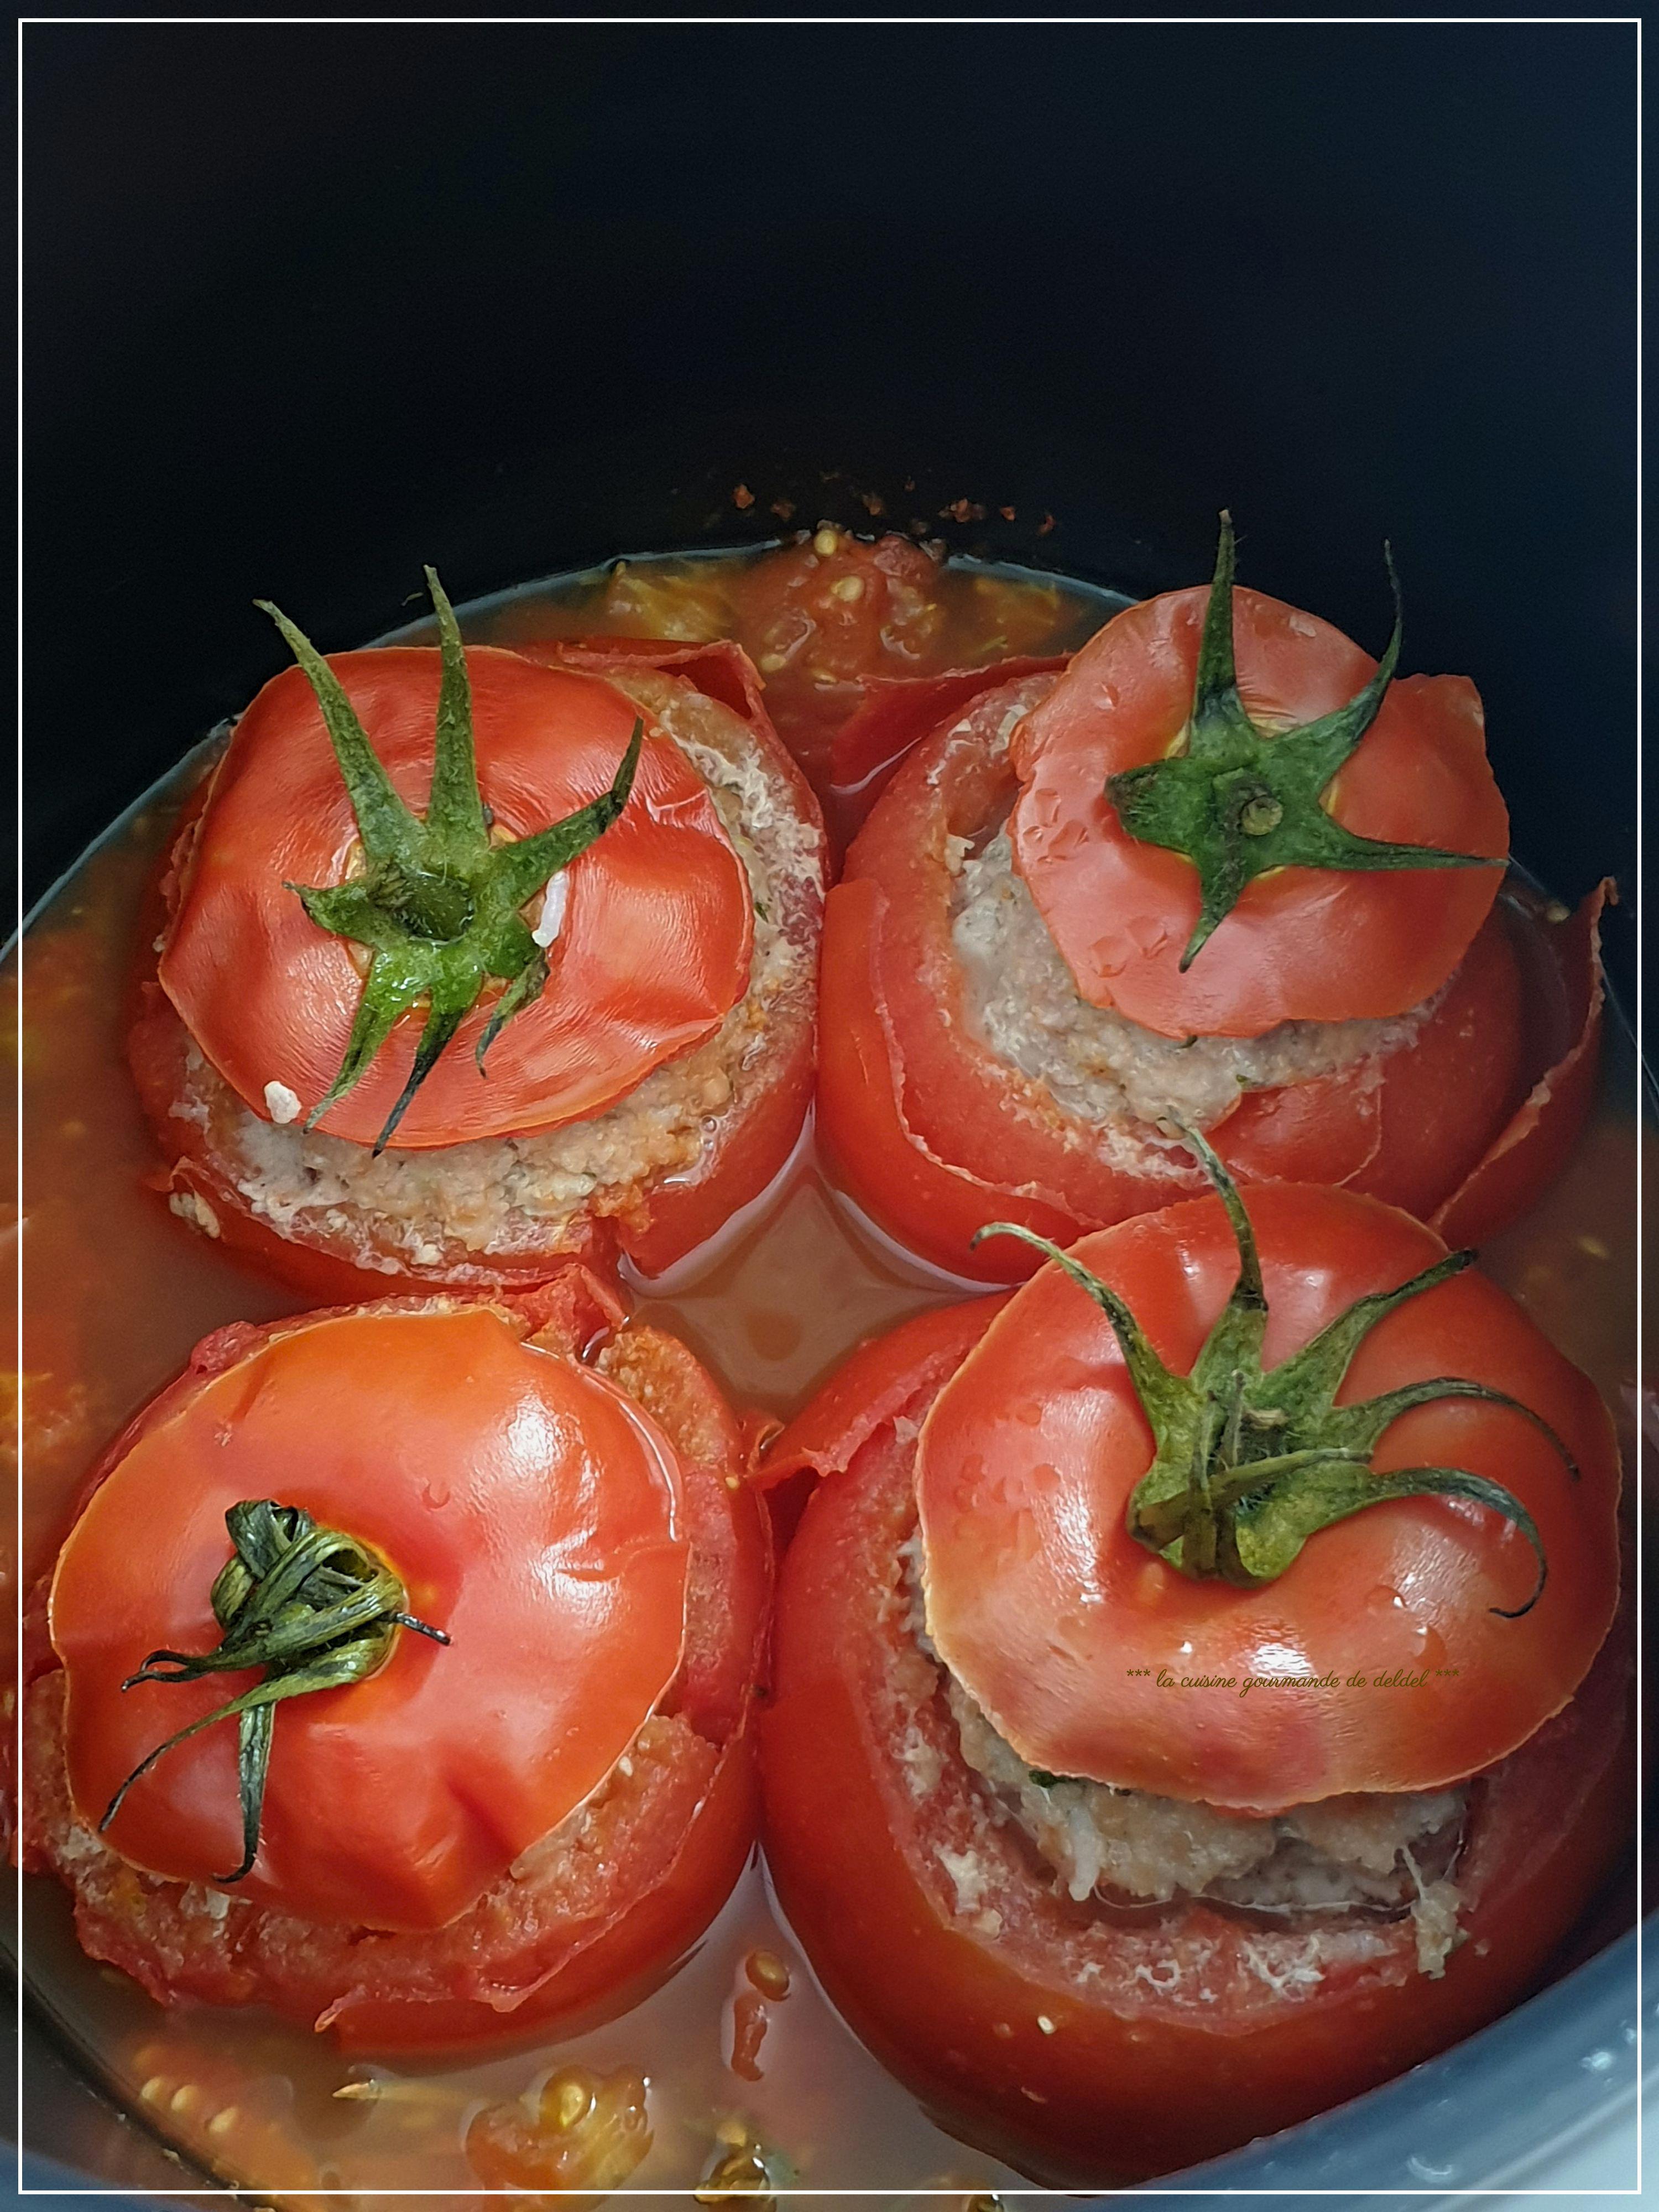 Congeler Des Tomates Farcies : congeler, tomates, farcies, TOMATES, FARCIES, COOKEO, Cuisine, Gourmande, Deldel